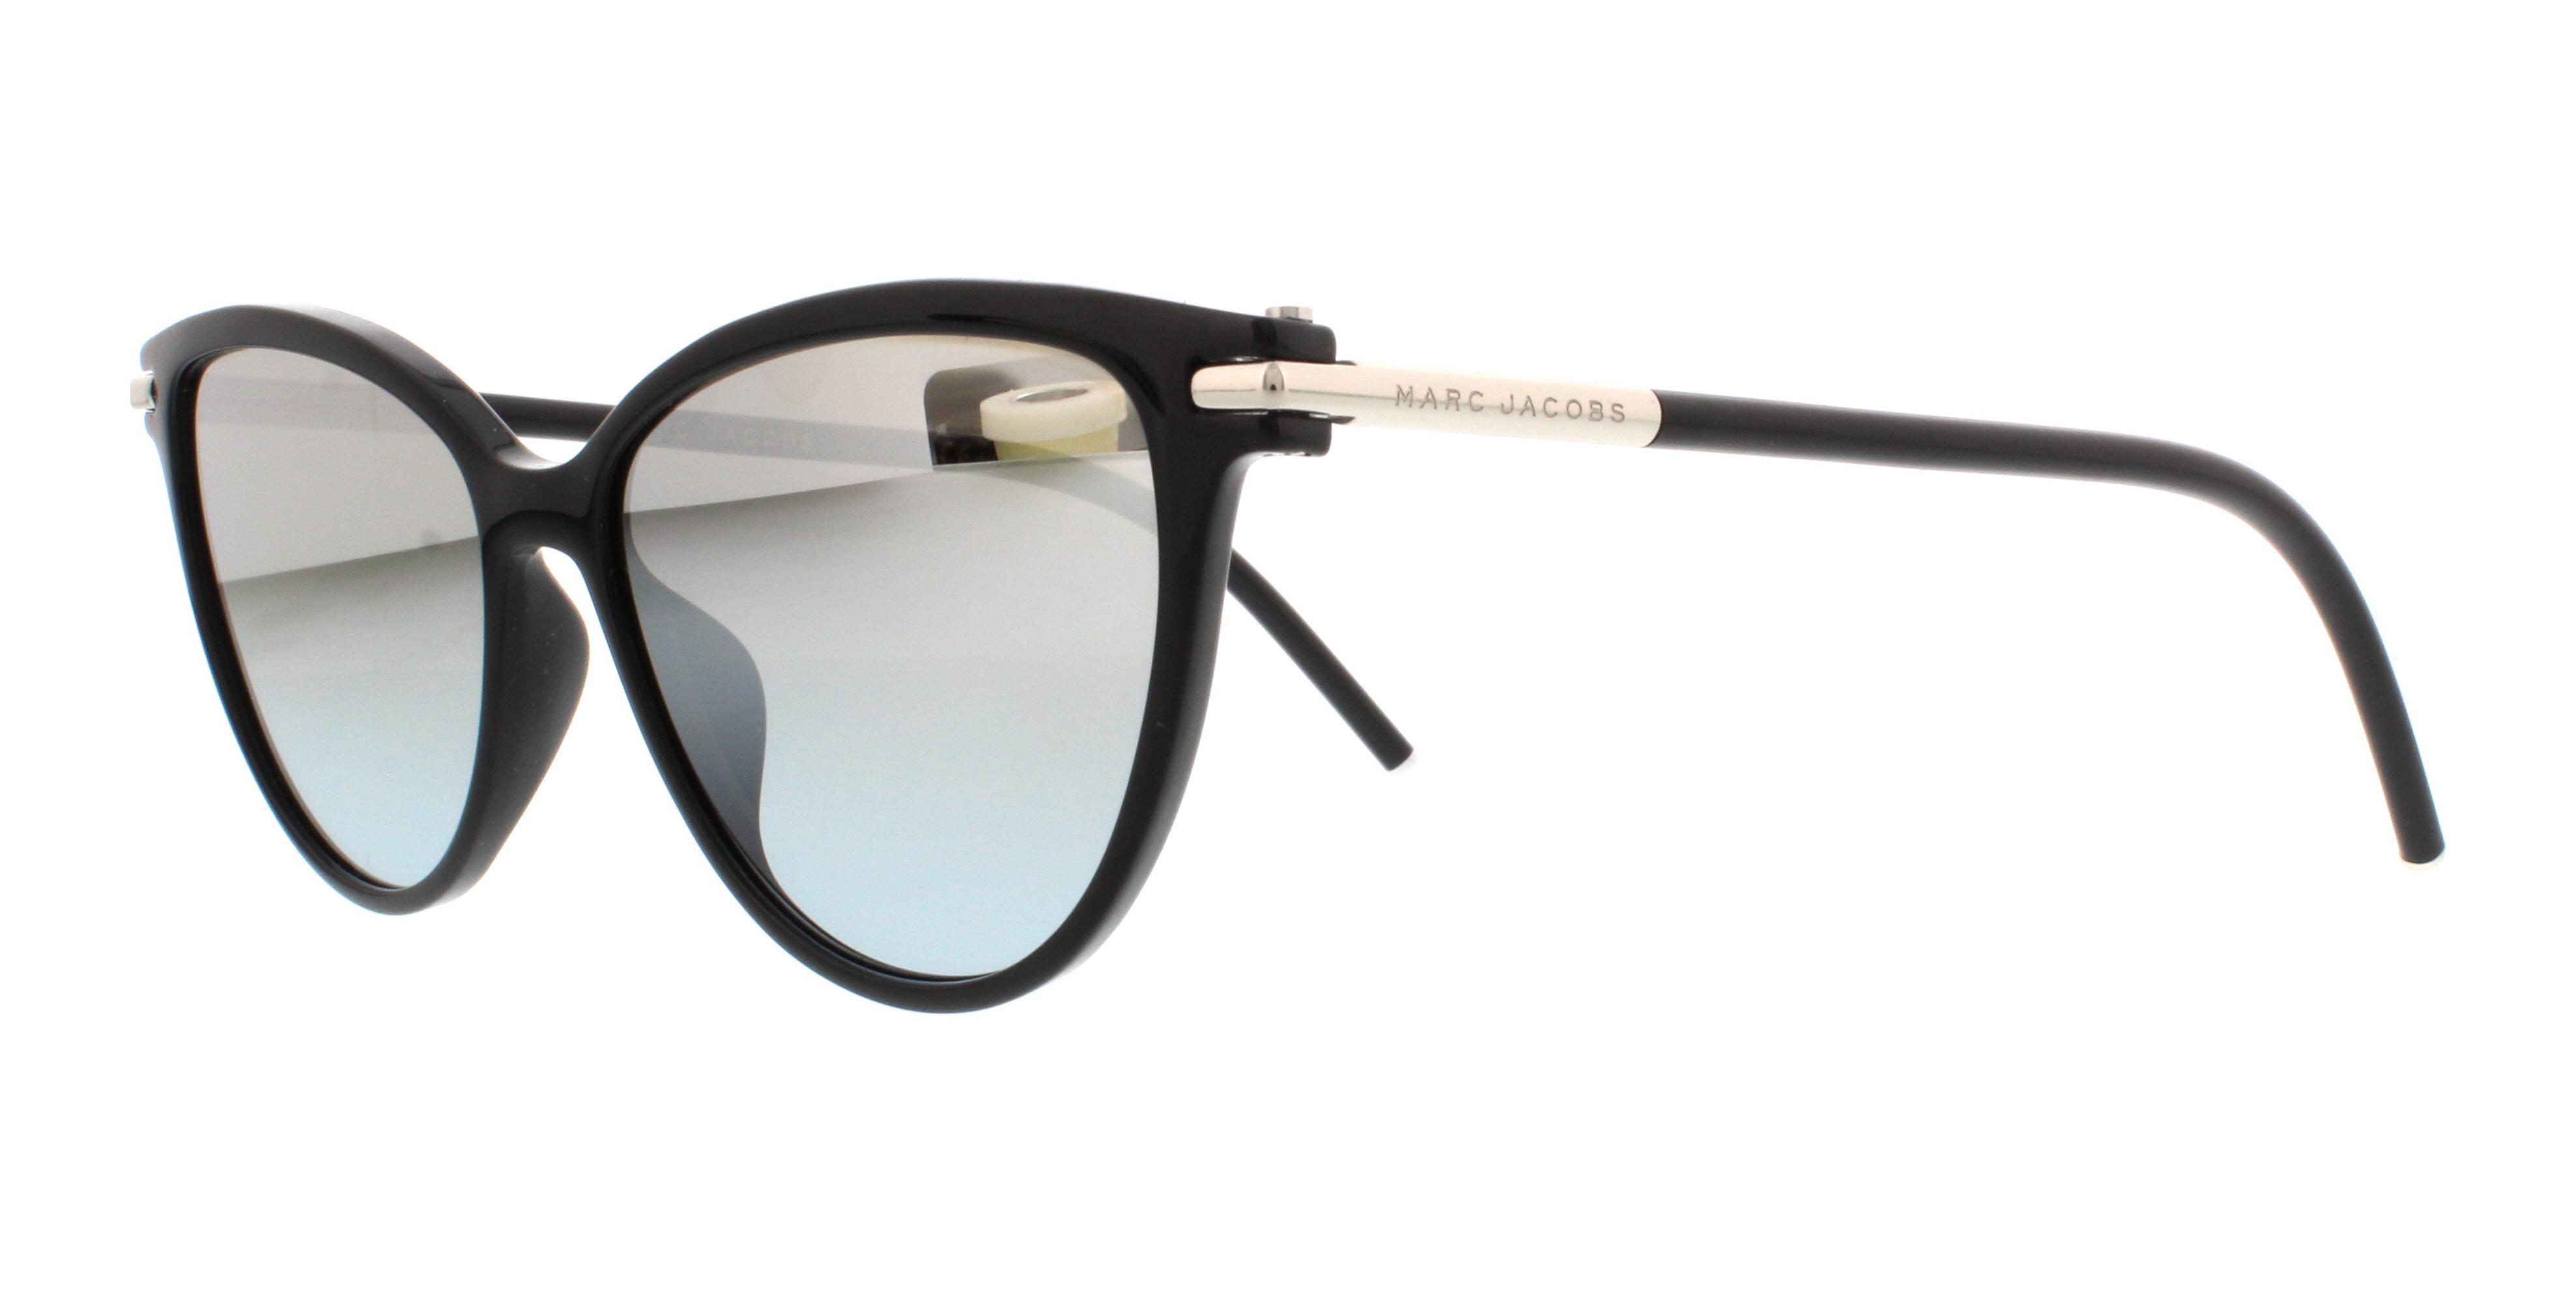 MARC JACOBS Sunglasses MARC 47 S 0D28 Black 53MM 827886149759  aeb50072cb8